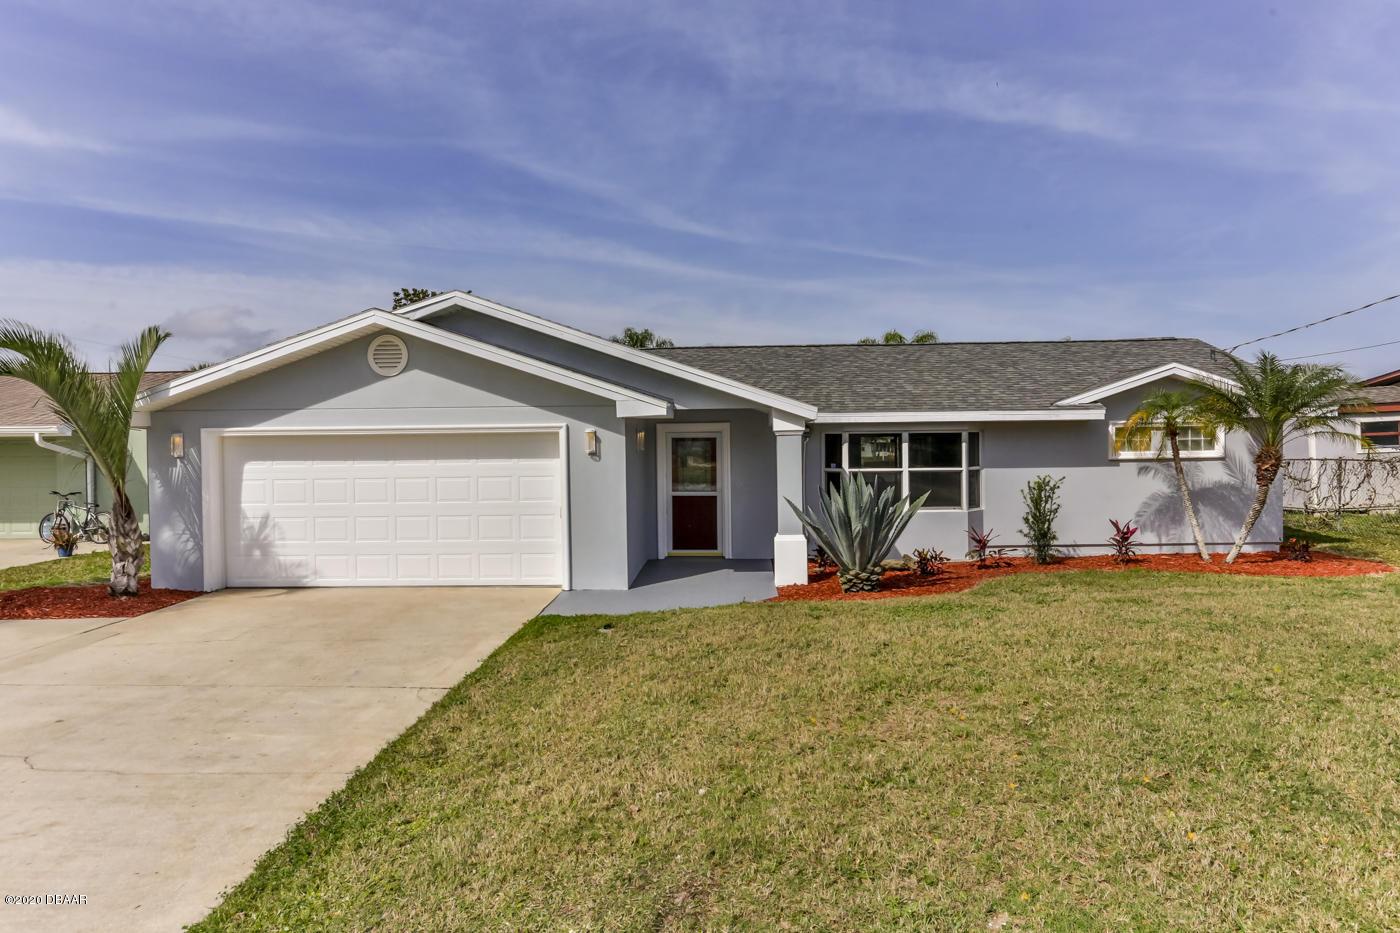 Photo of 992 Shockney Drive, Ormond Beach, FL 32174